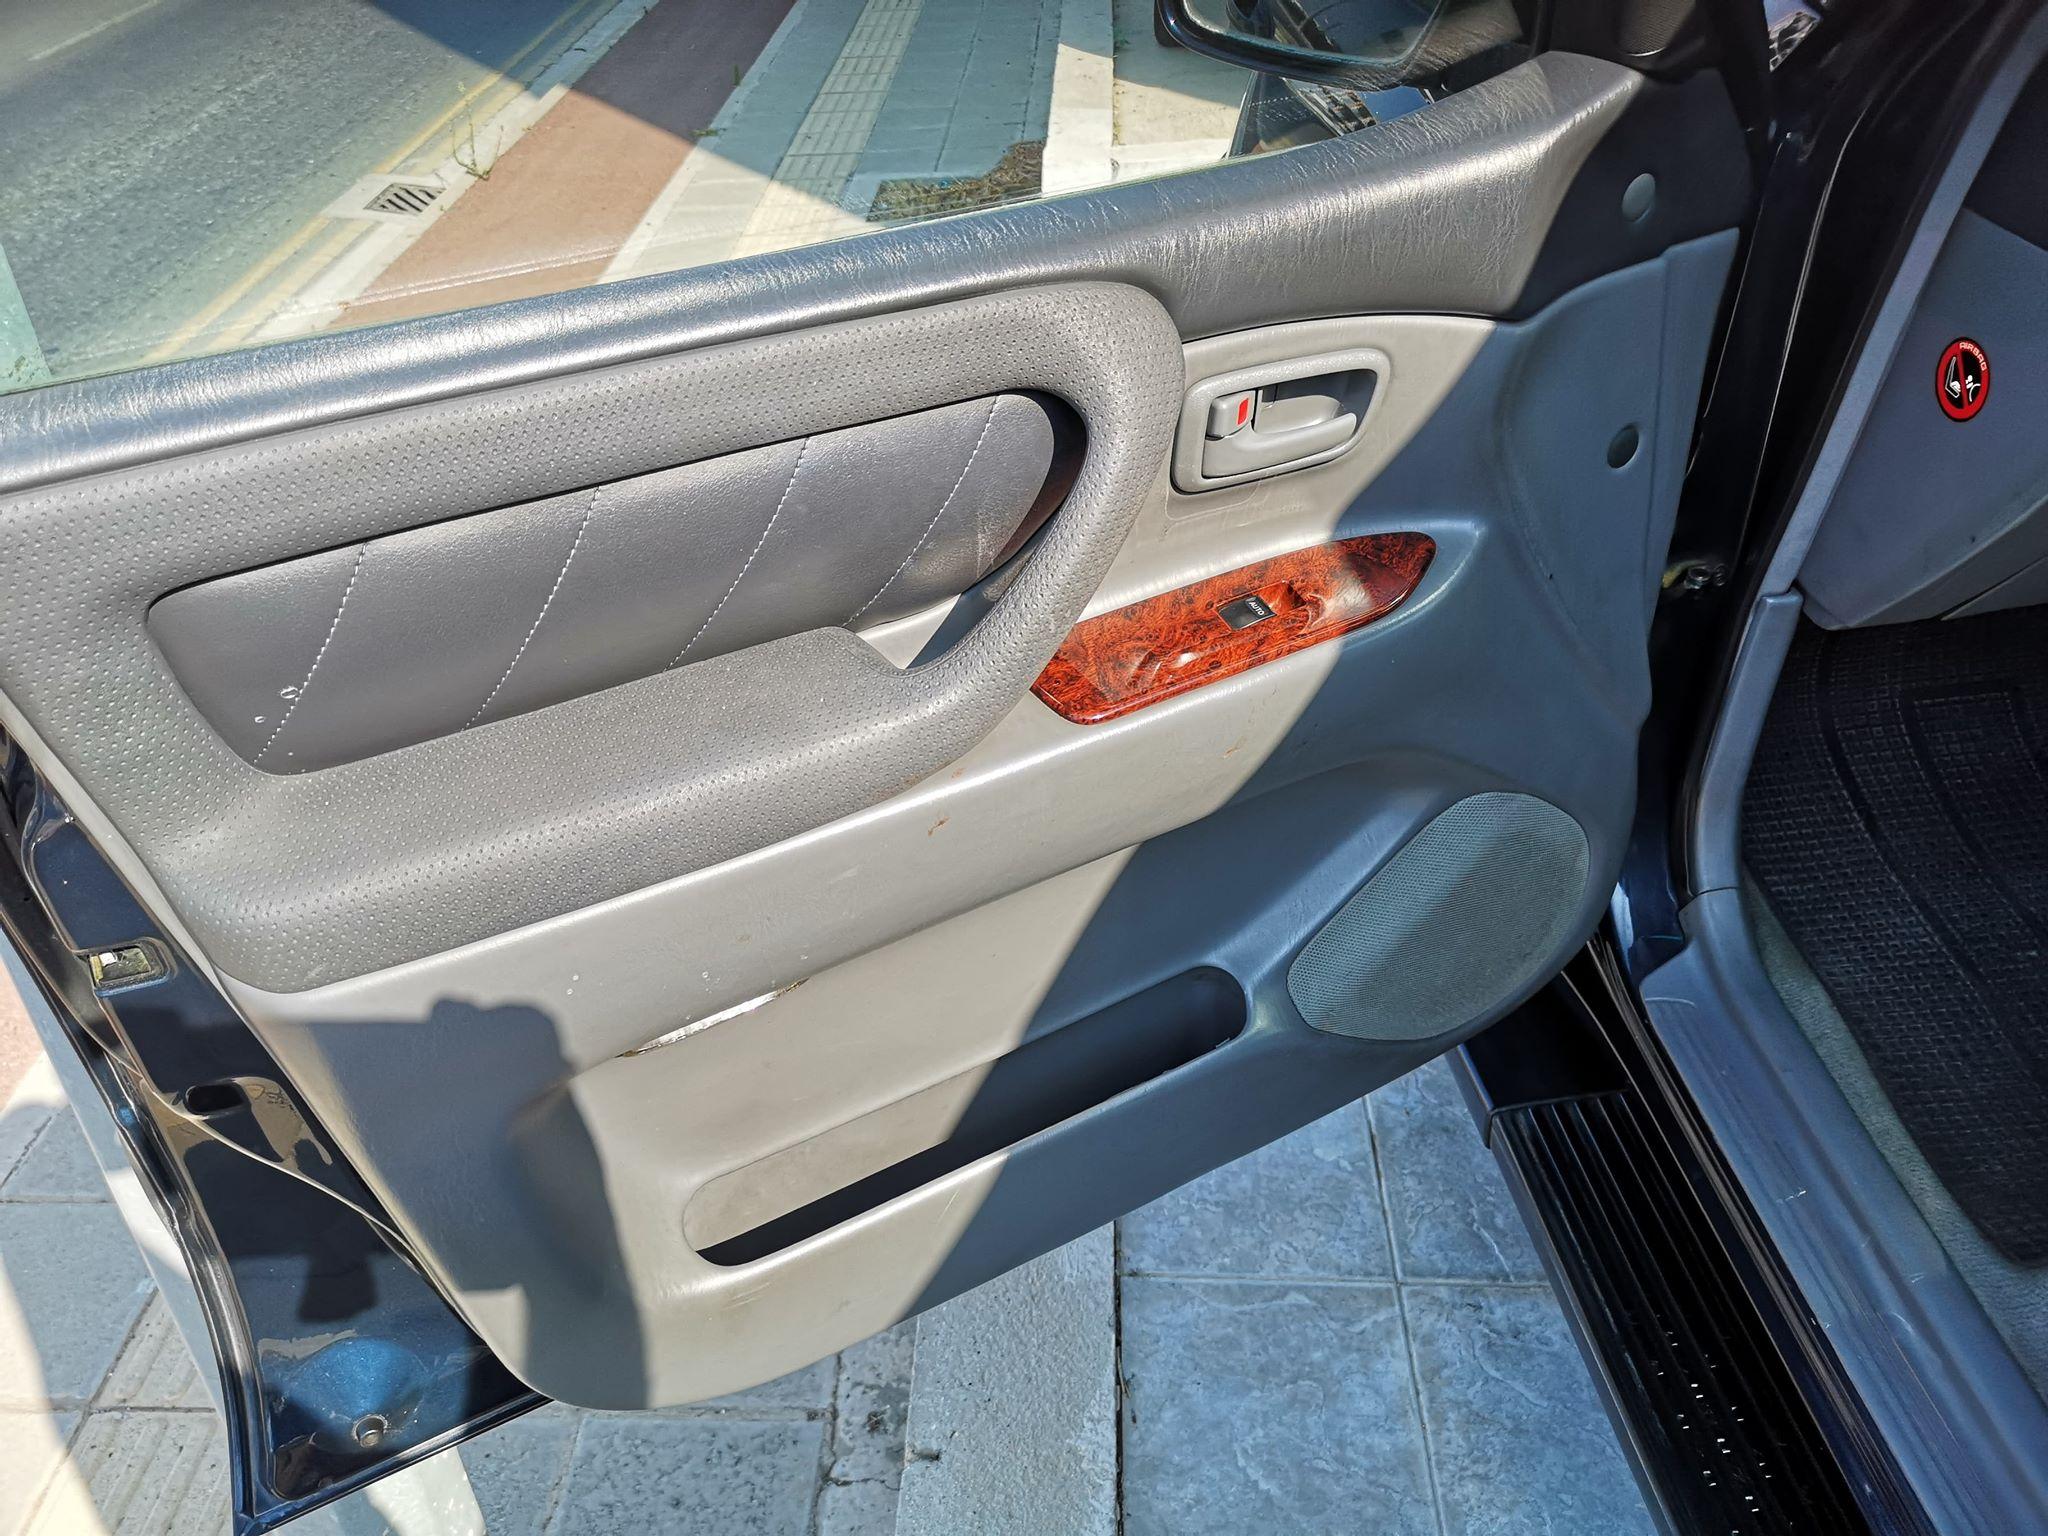 Toyota Land Cruiser 100 – Series 2002 – 7 Seats